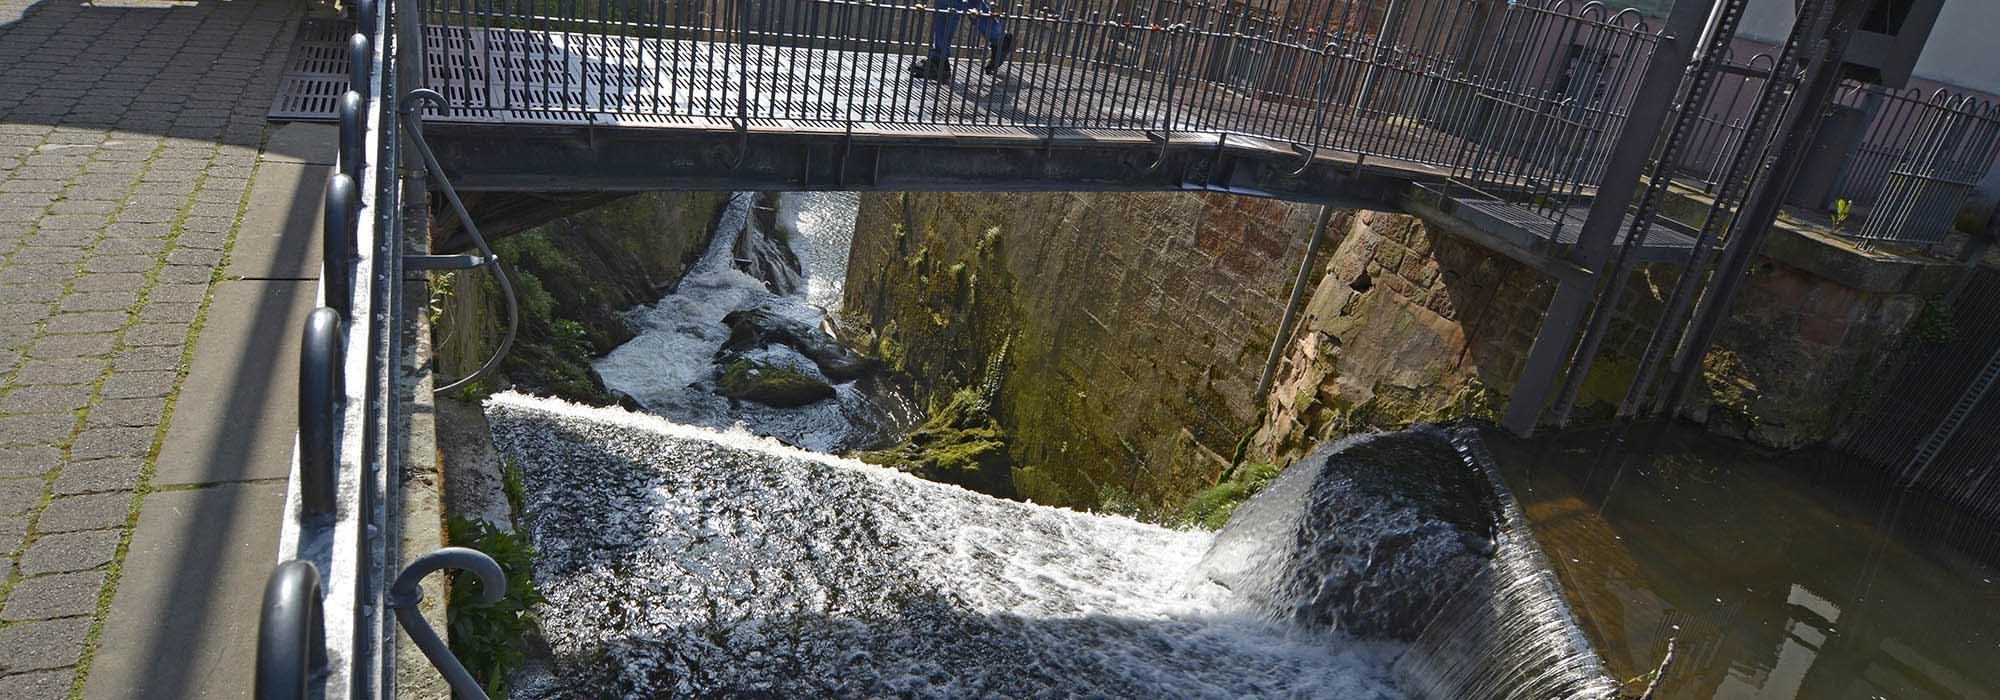 _ARN1260-Saarburg-Wasserfall